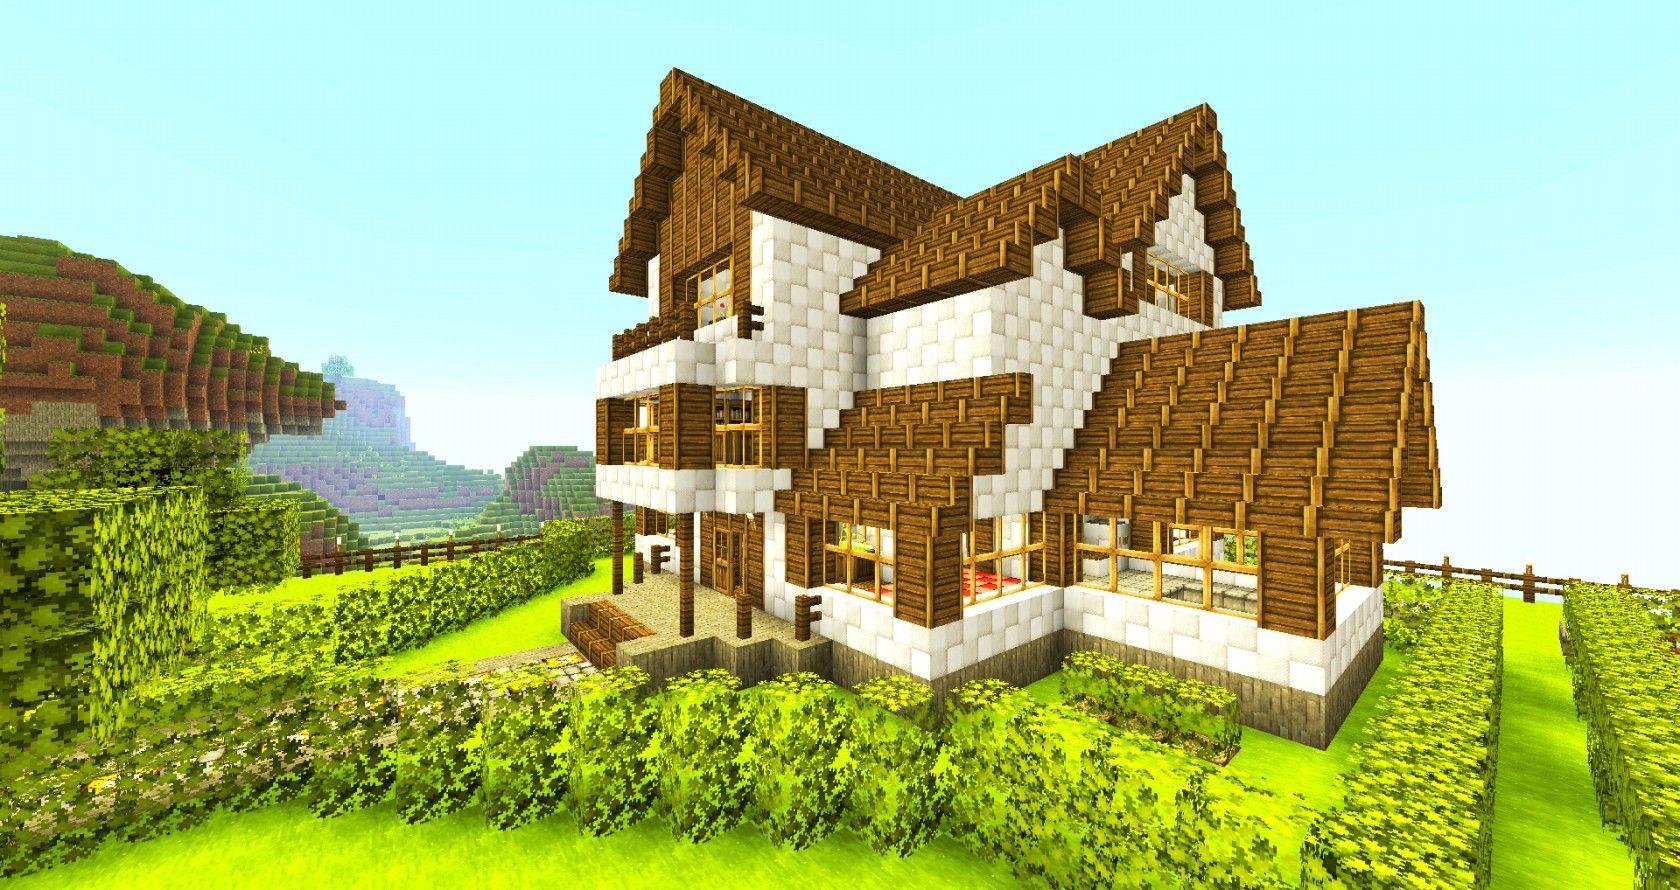 Cool Wallpaper Minecraft Houses - 92542717076907f2df866e1f897a4e5d  Trends_163188.jpg